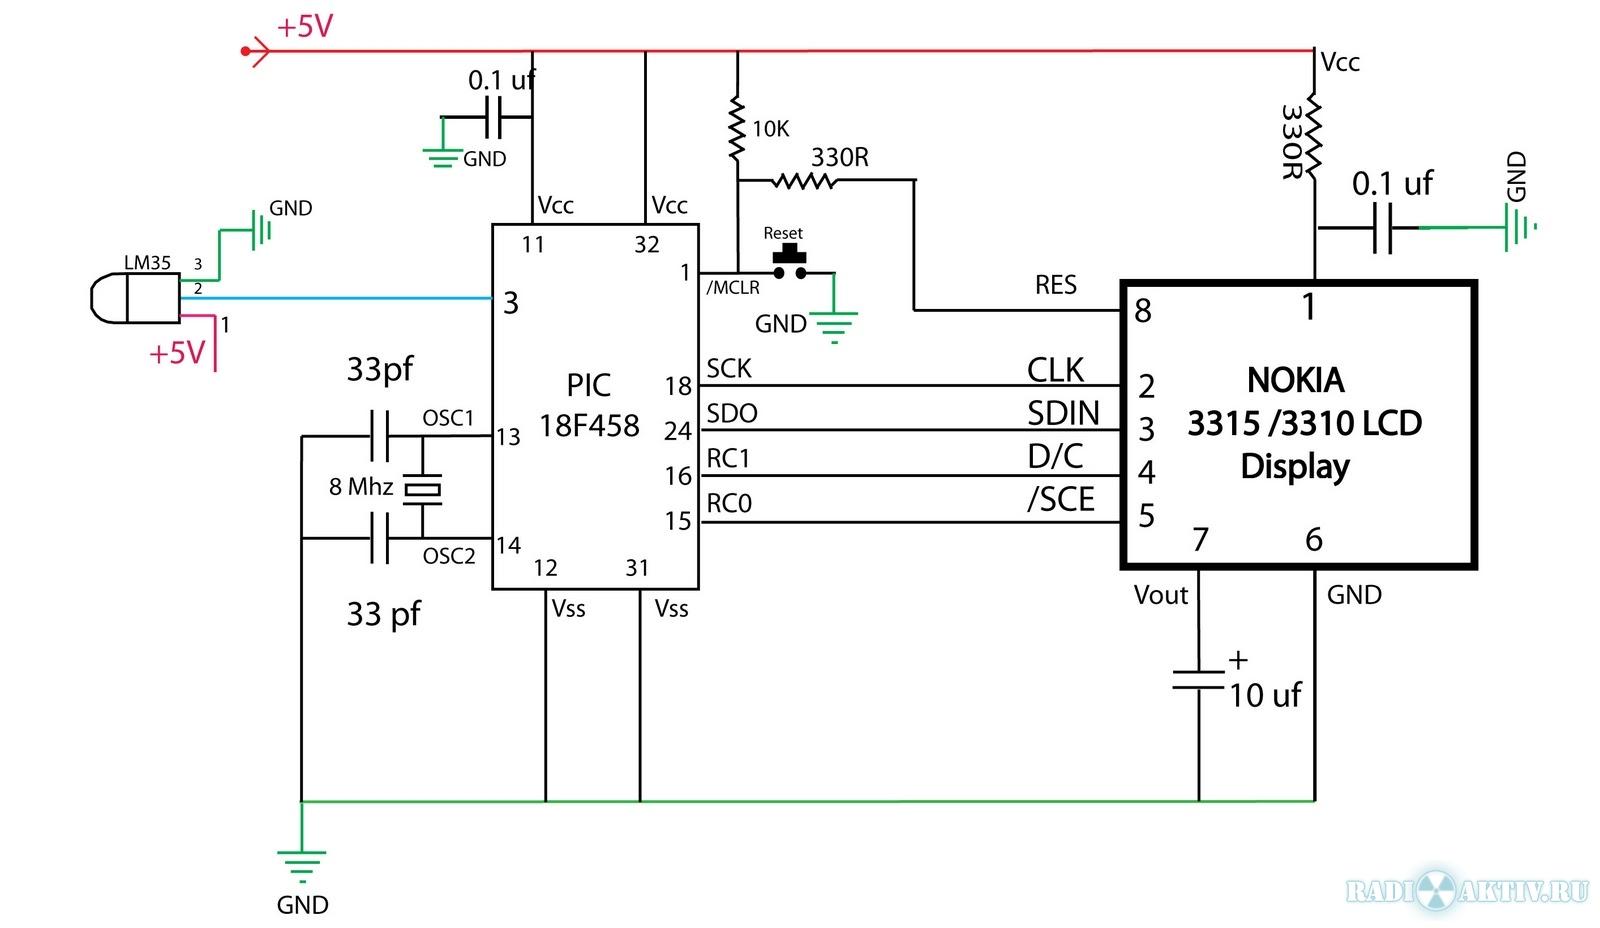 tidygavtax lcd nokia pic circuit